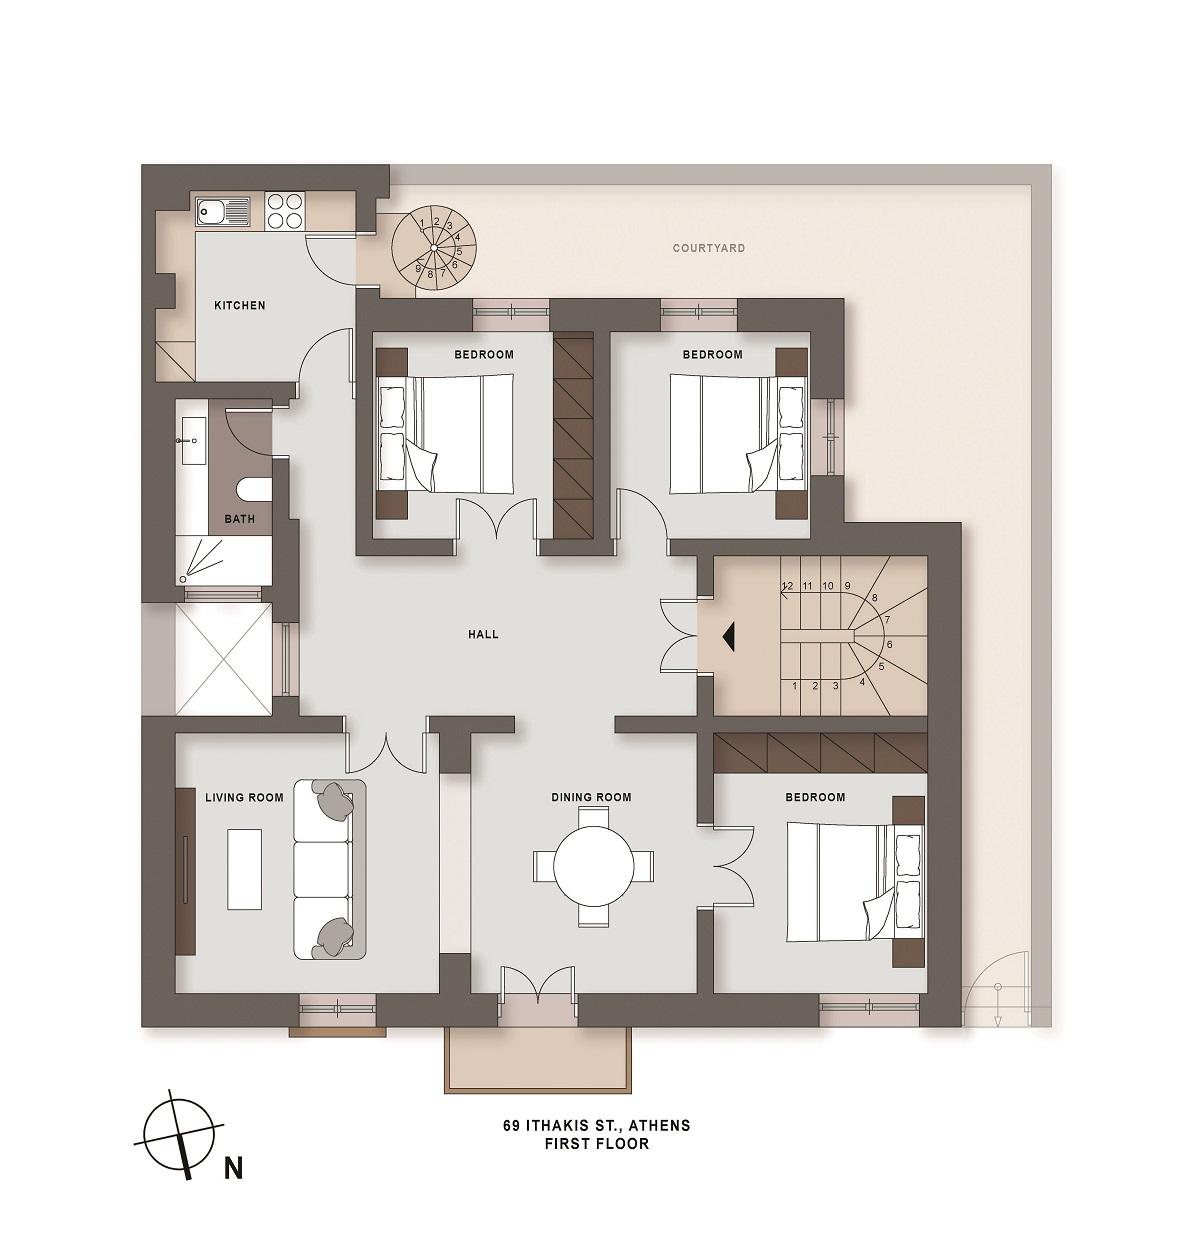 Ithakis 69 1st floor plan